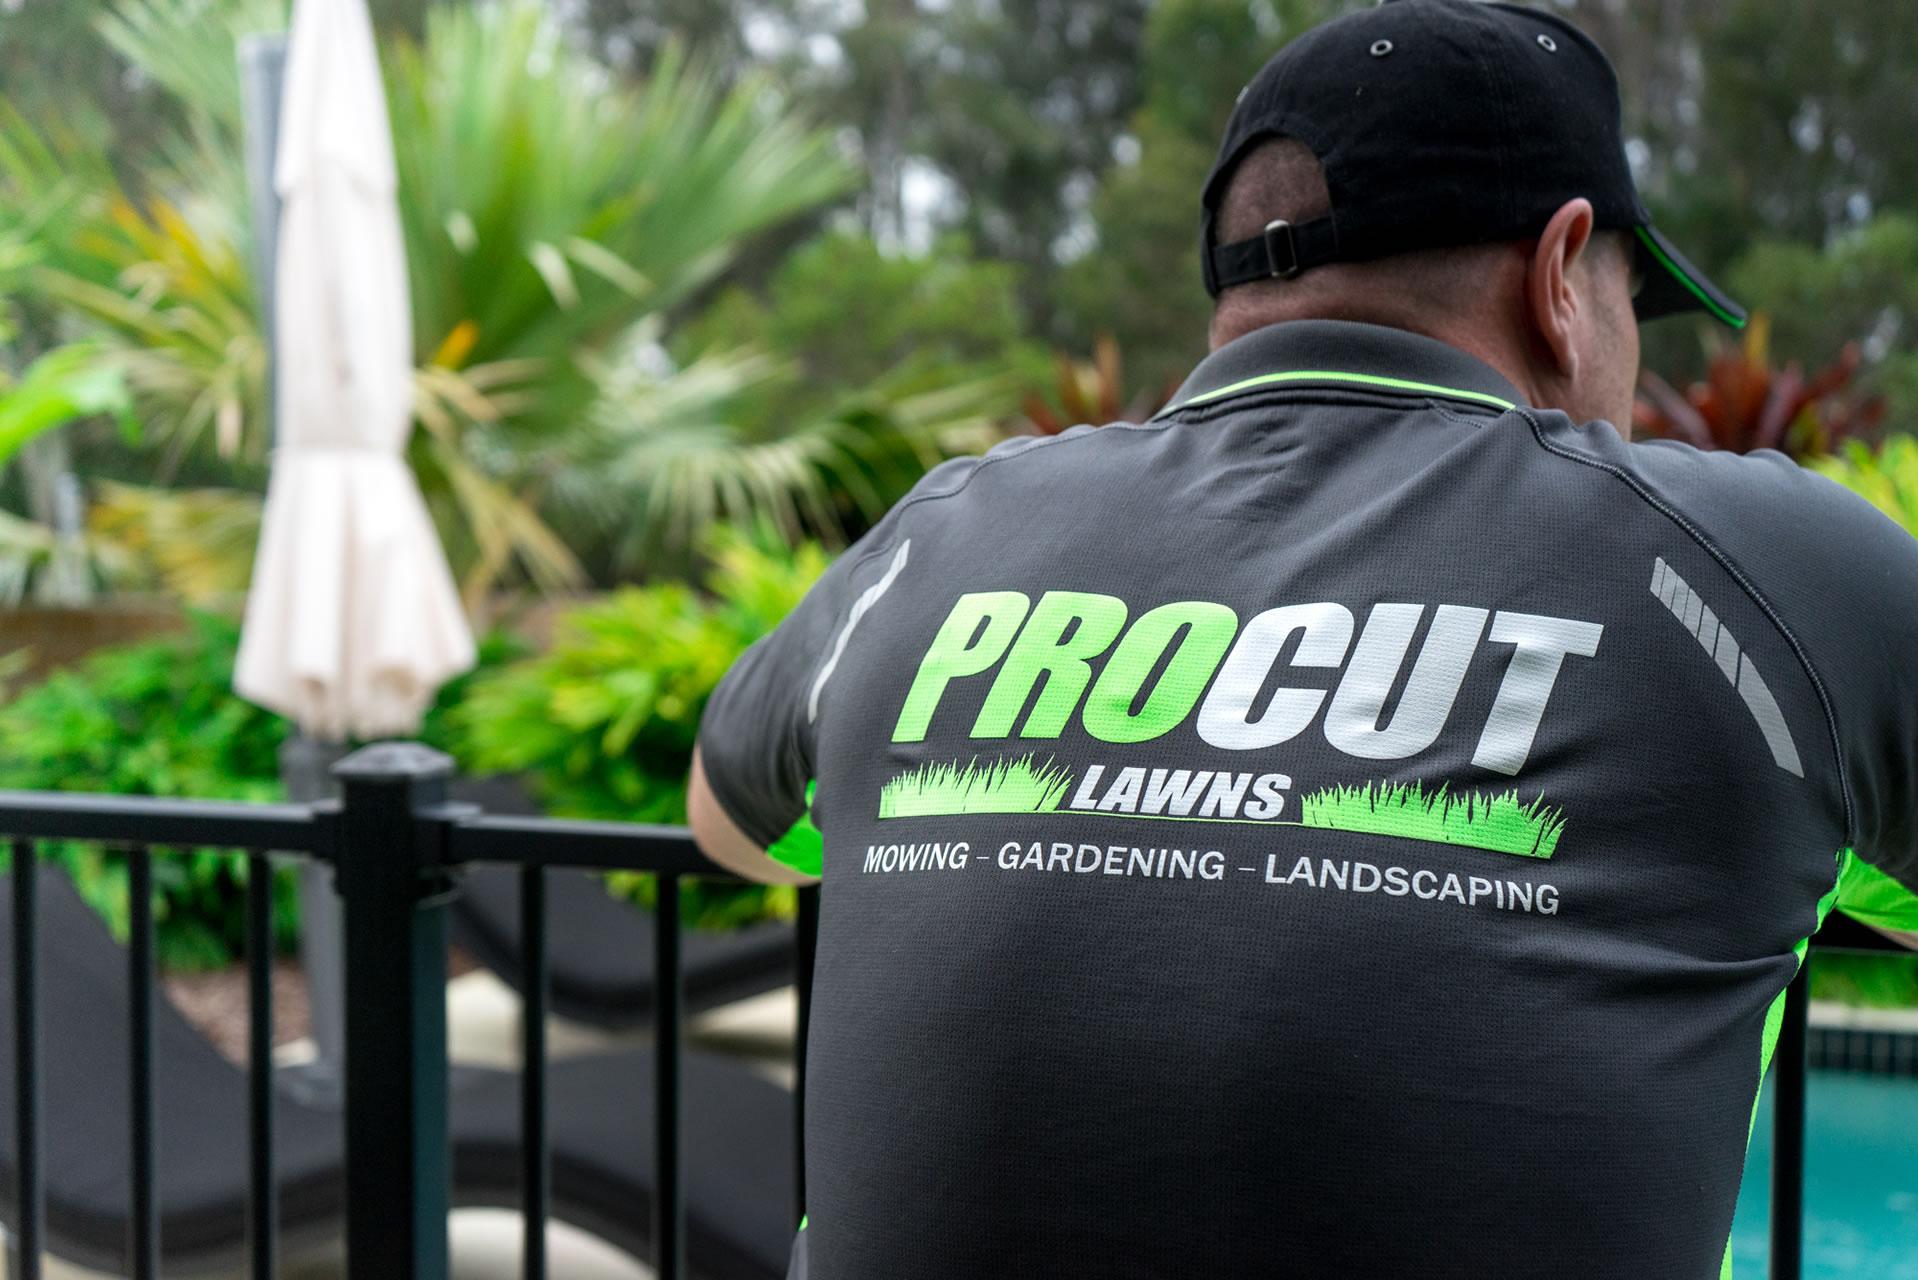 pro cut lawns operator